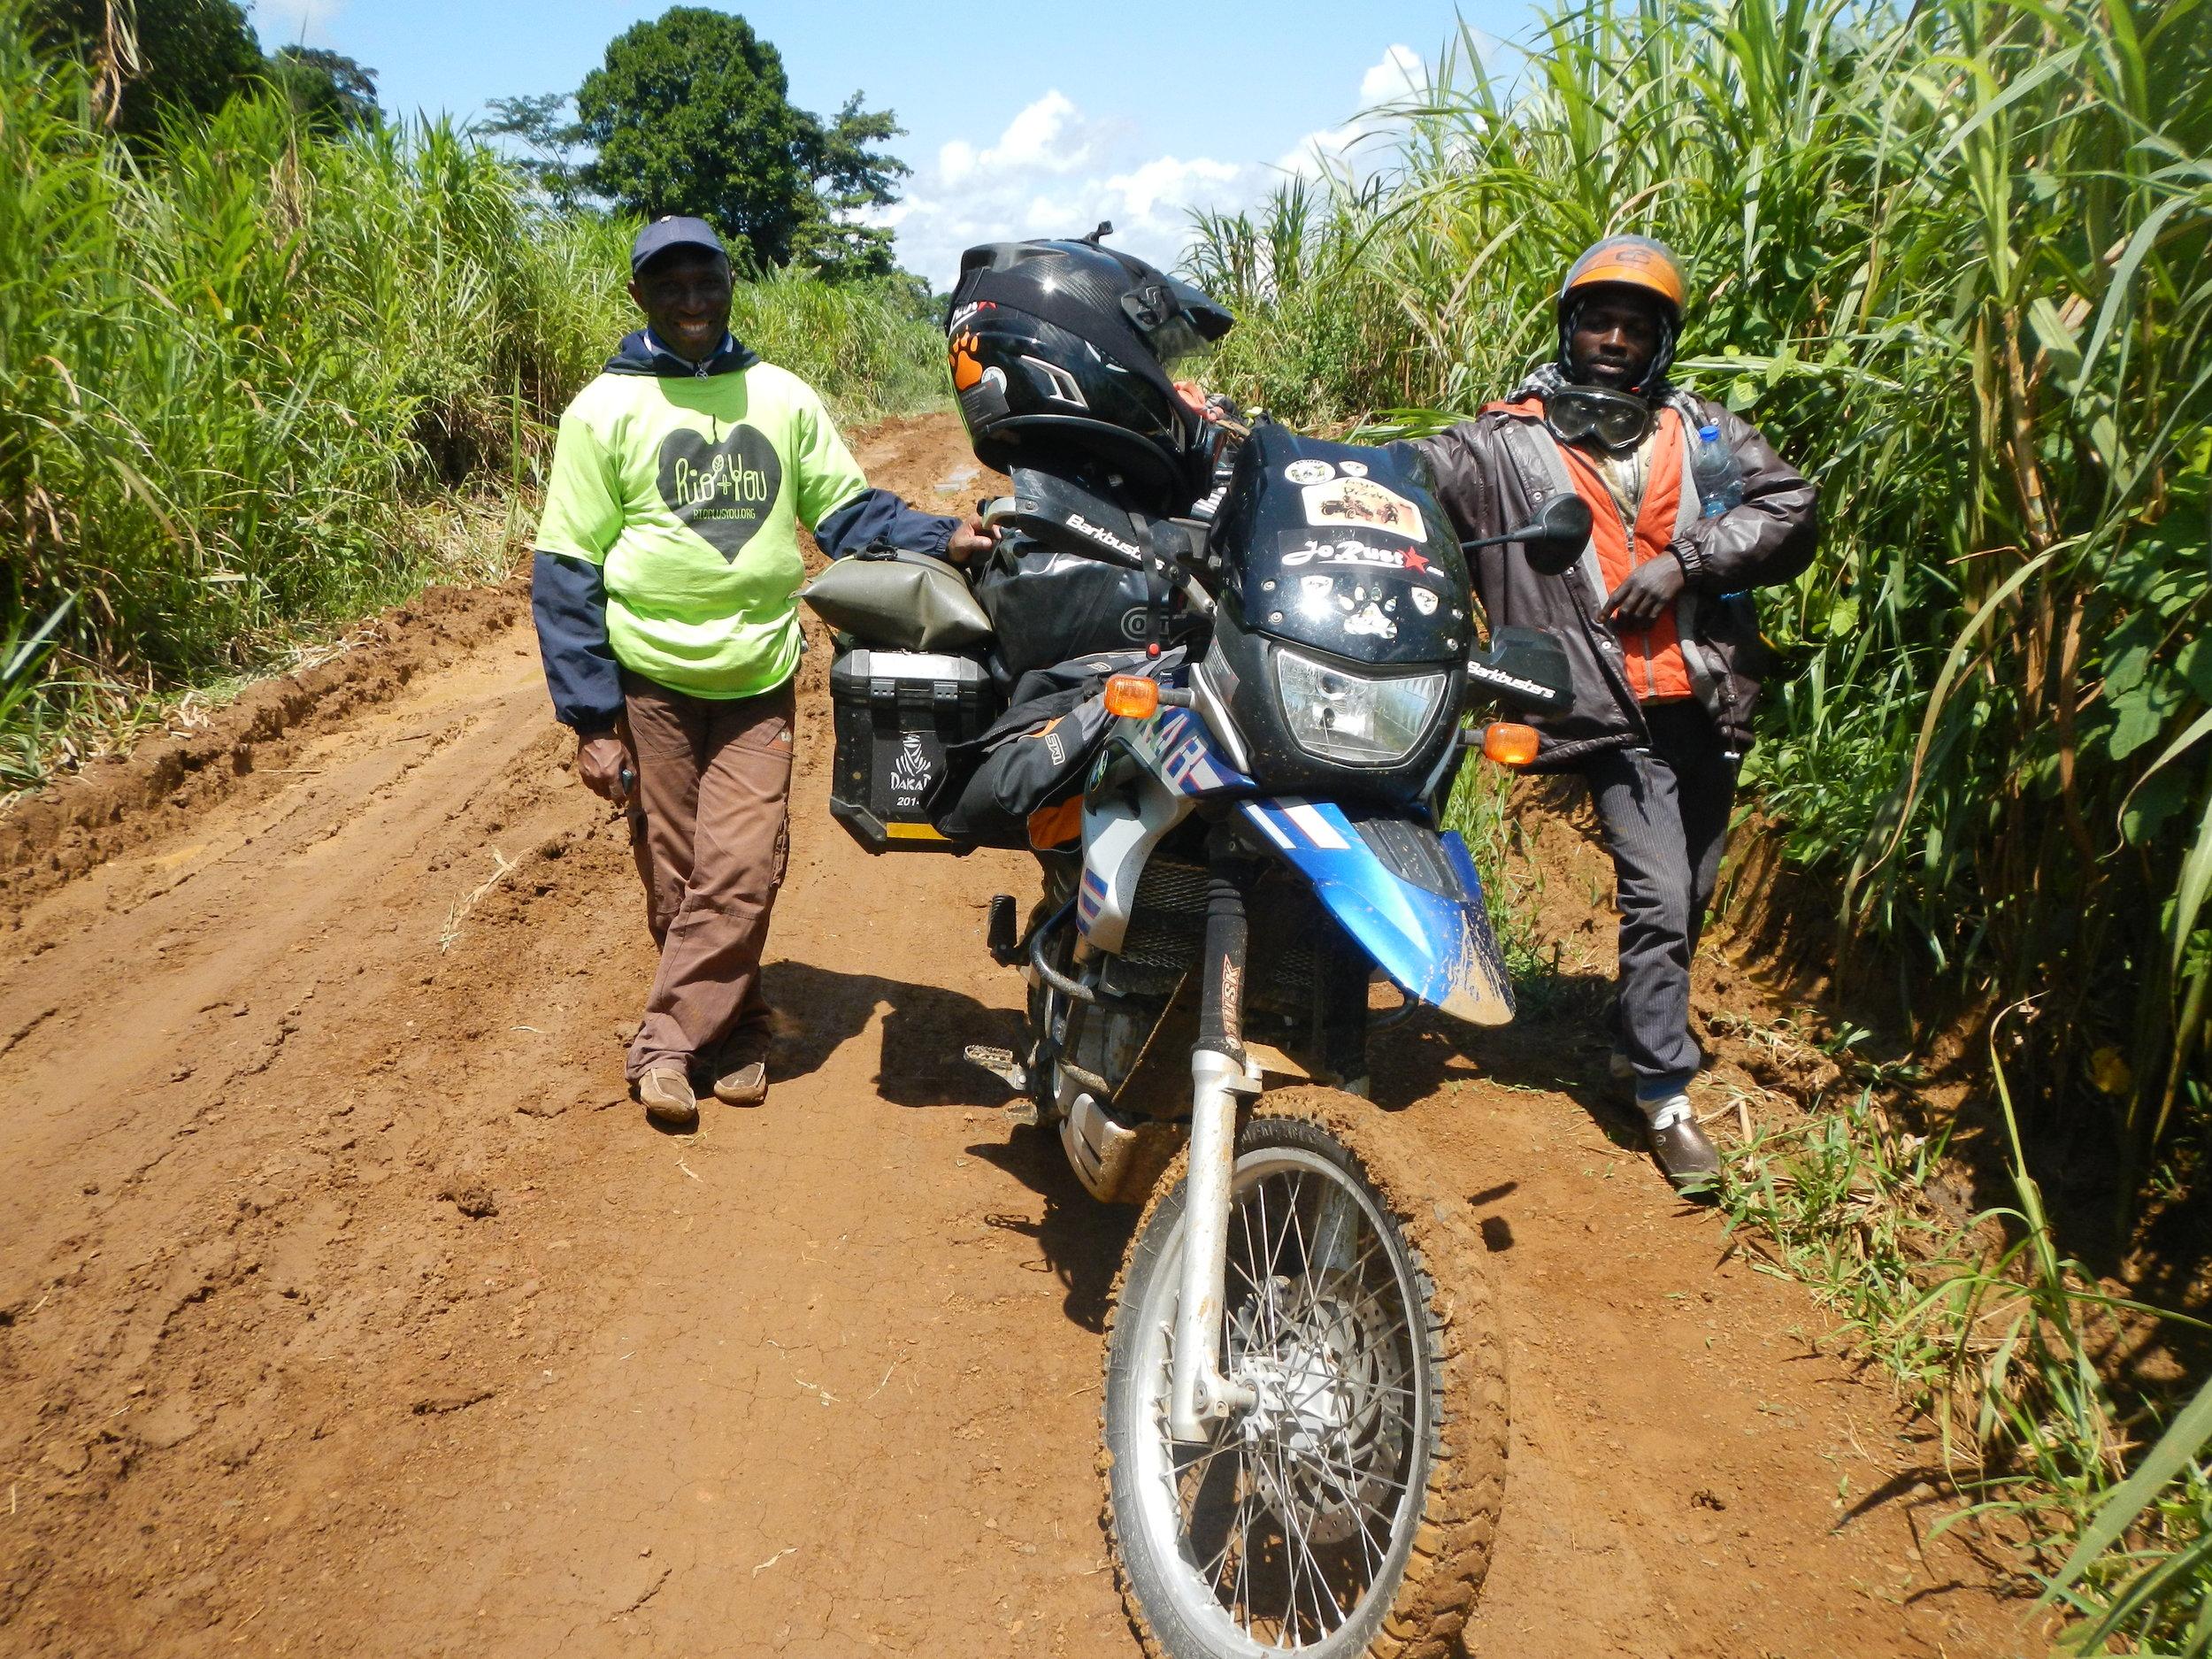 Jo-Rust-Adventure-Rider-Radio-Motorcycle-Podcast-5.JPG